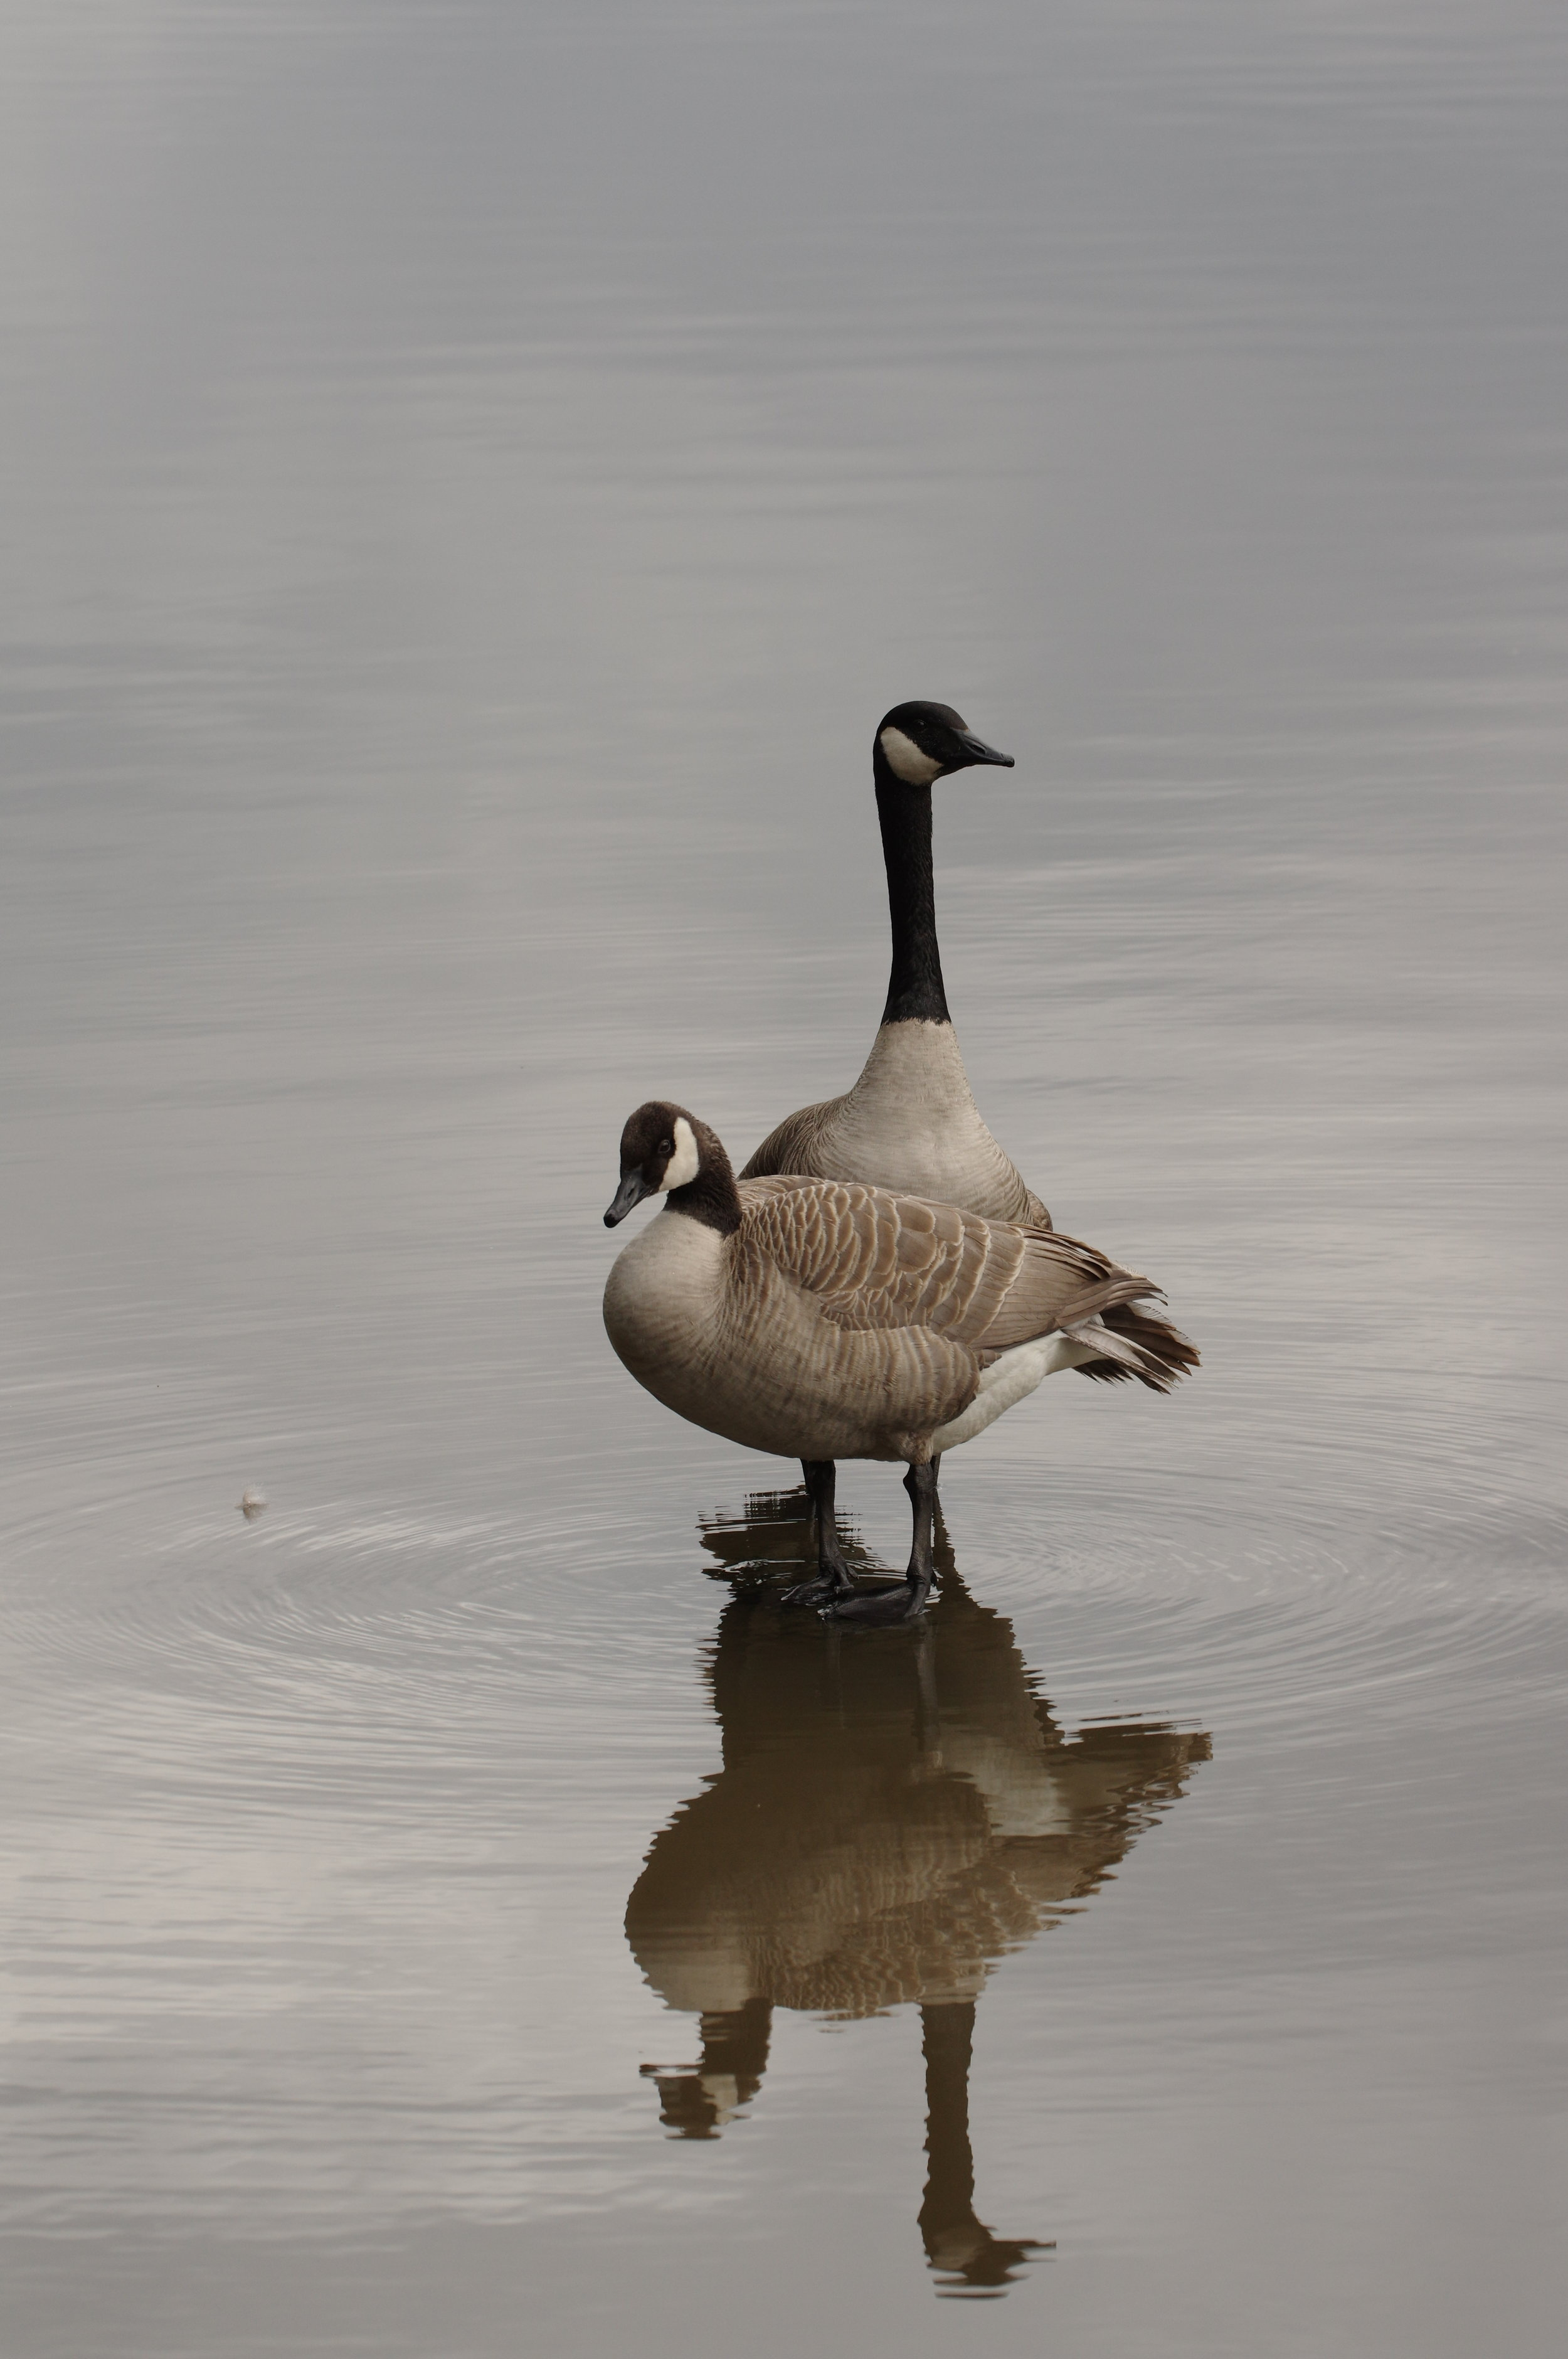 Canada Goose Reflection